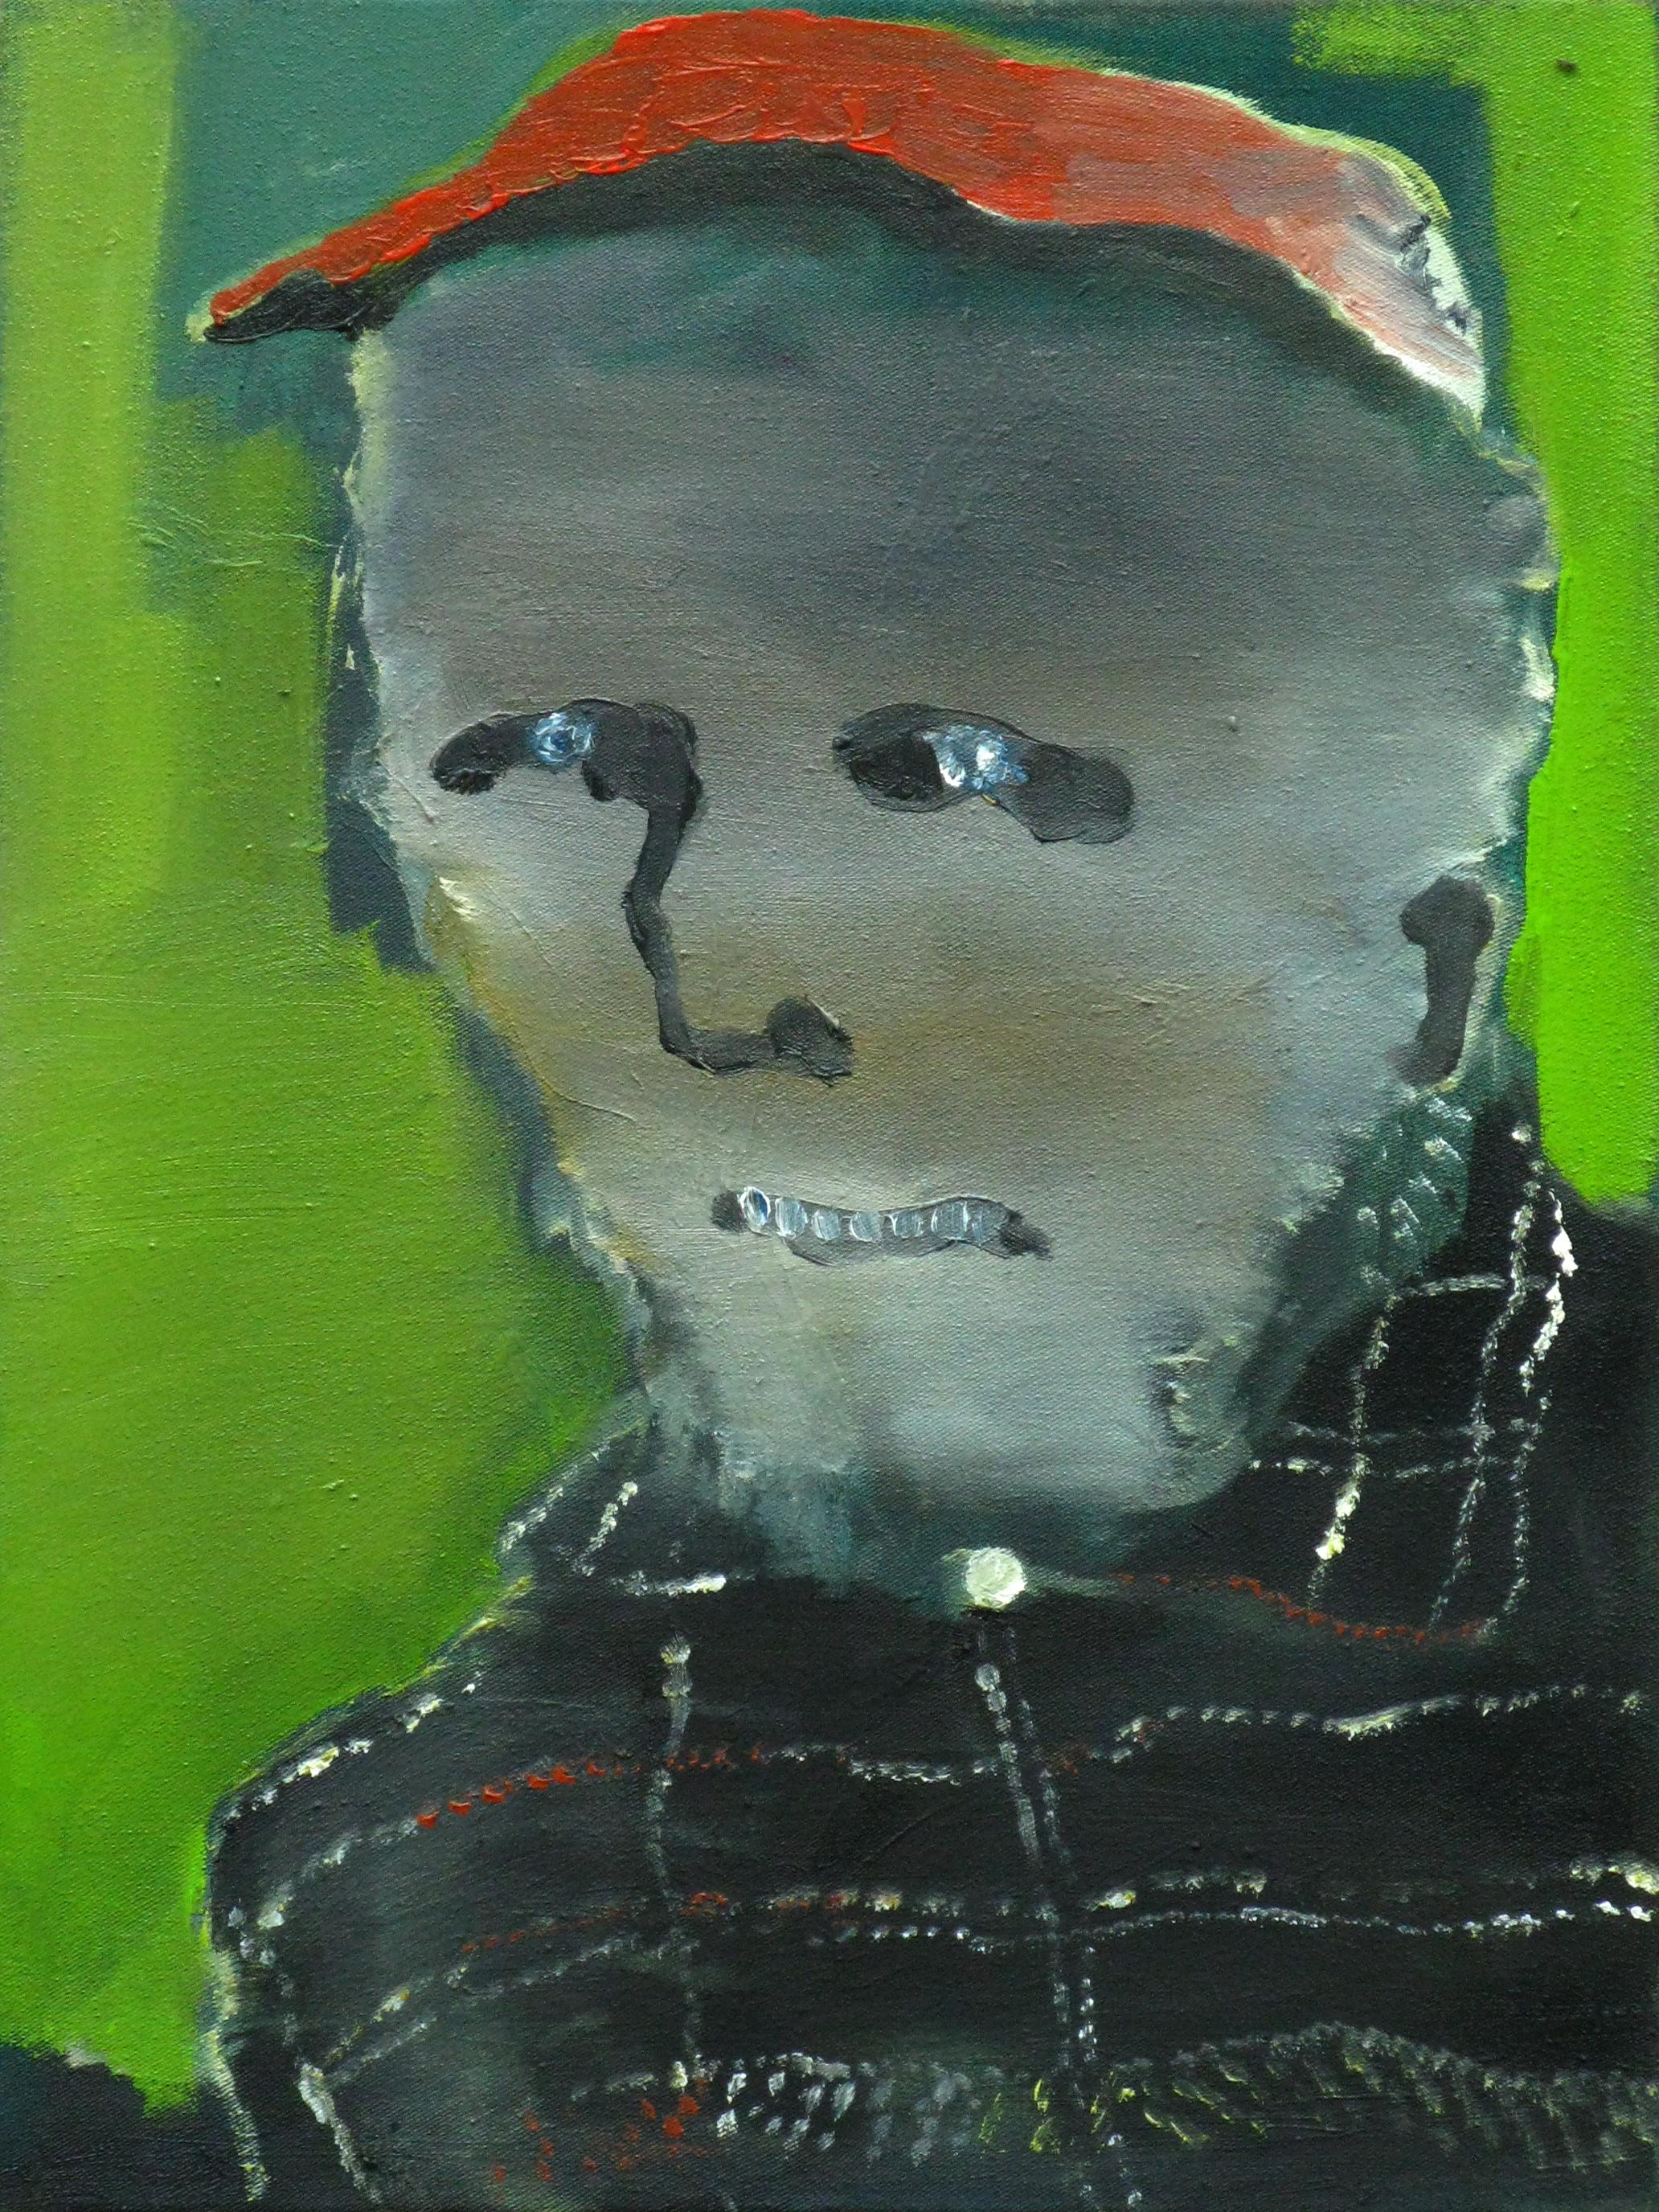 Grinser, 2008, oil on canvas, 44x33cm.jpg